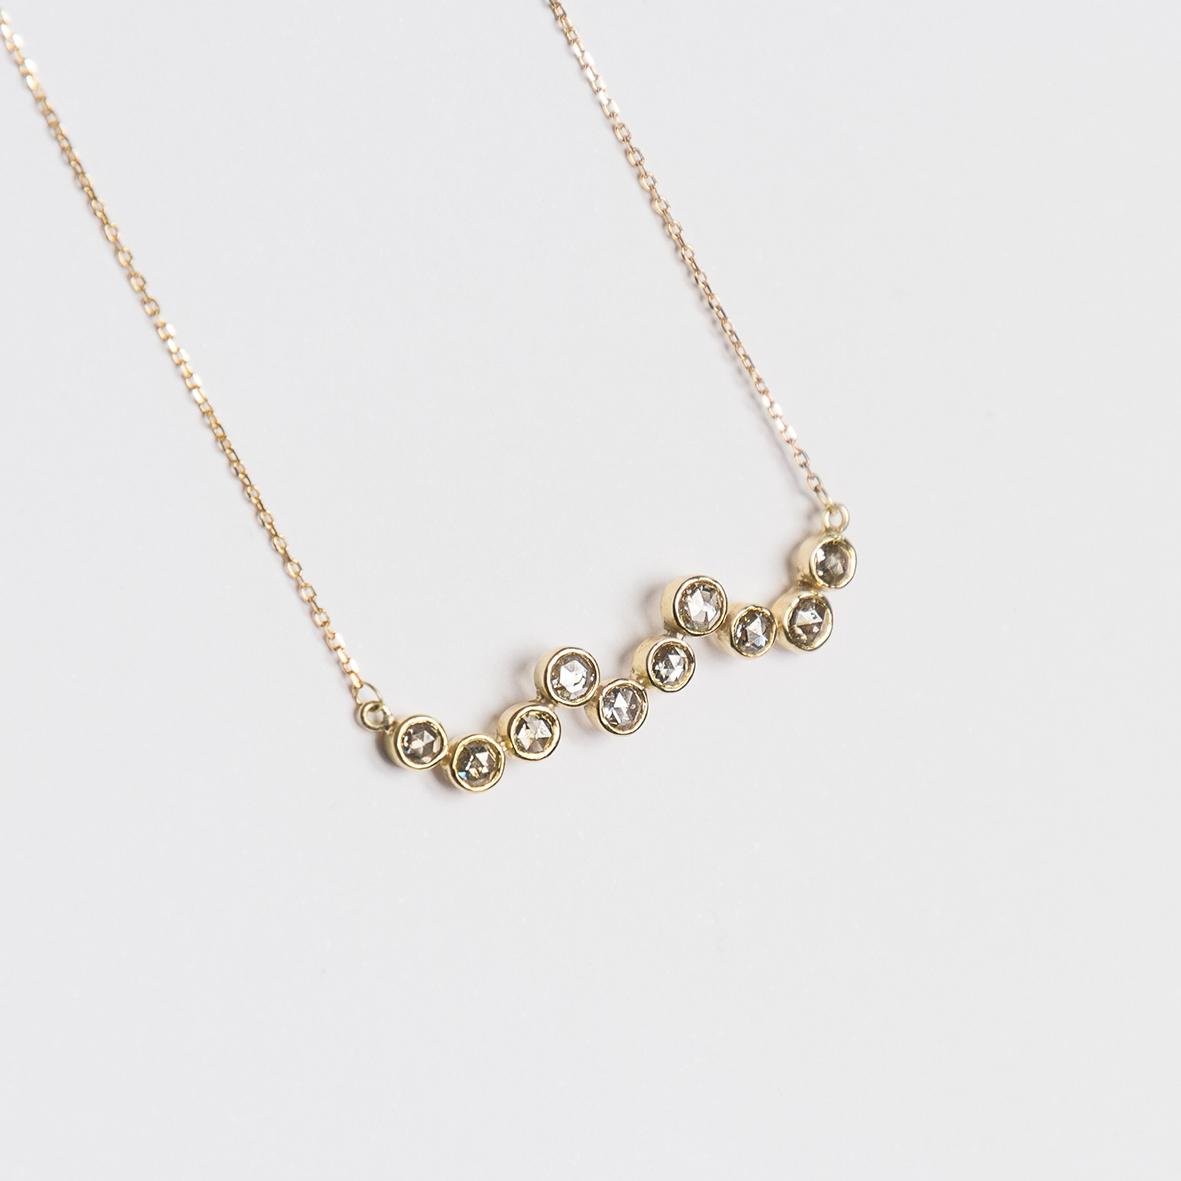 1. OONA_philo_ficha2_waves diamond necklace